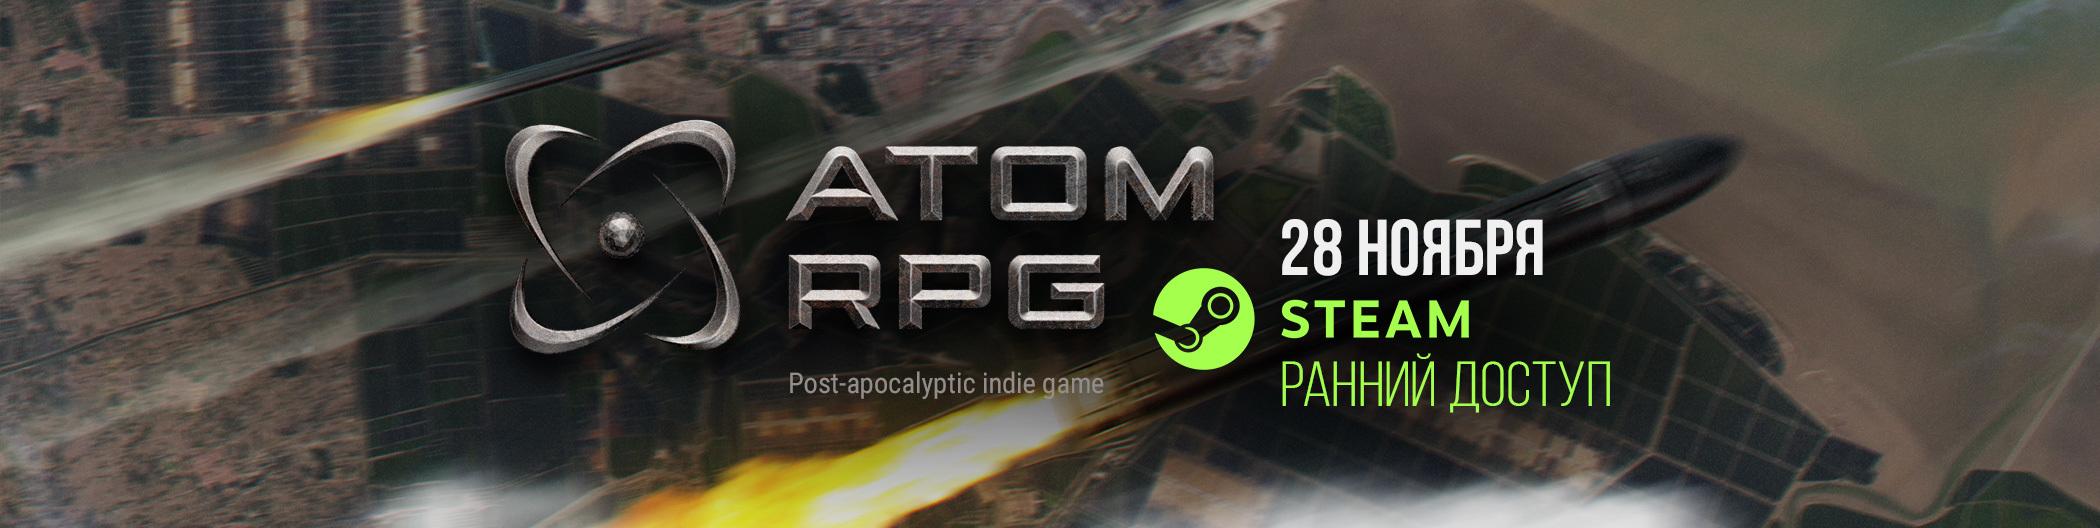 ATOM RPG - ATOM RPG атом рпг, отом